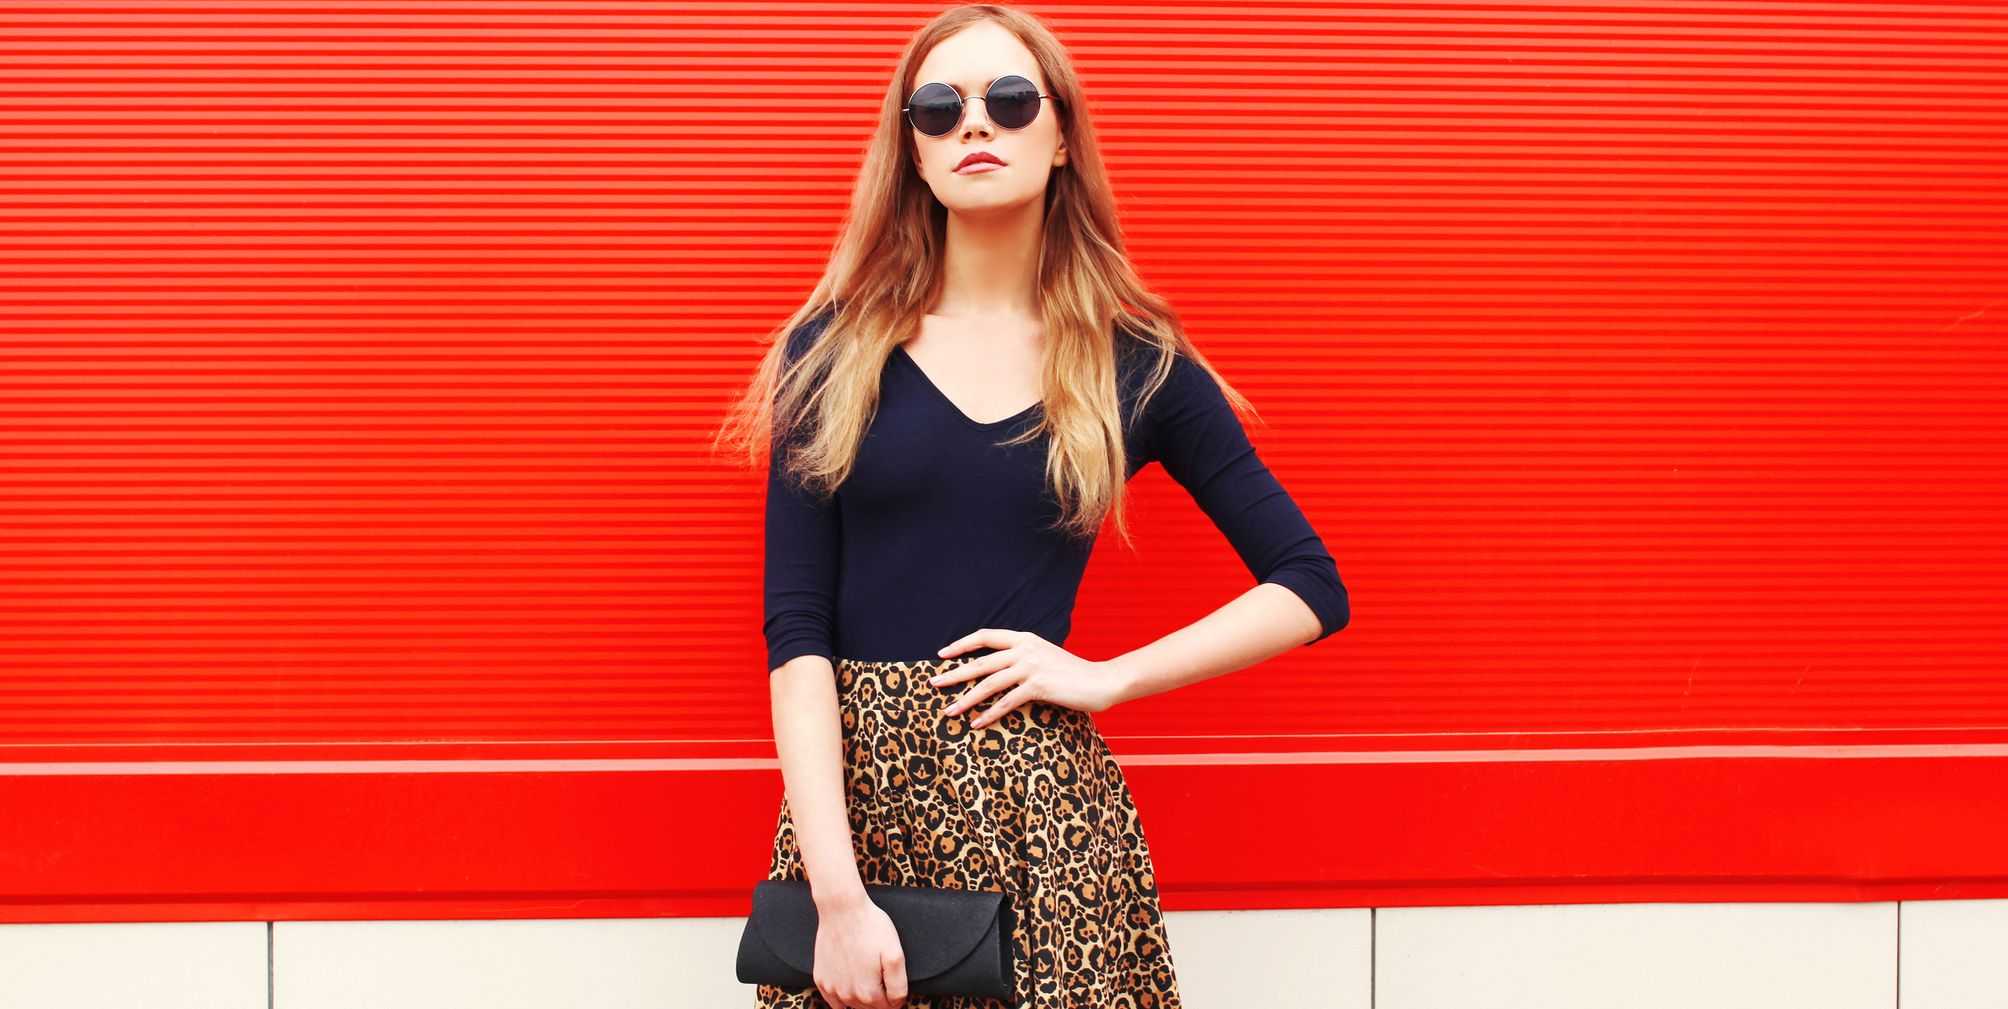 Fashion beautiful woman in leopard skirt sunglasses handbag clutch posing